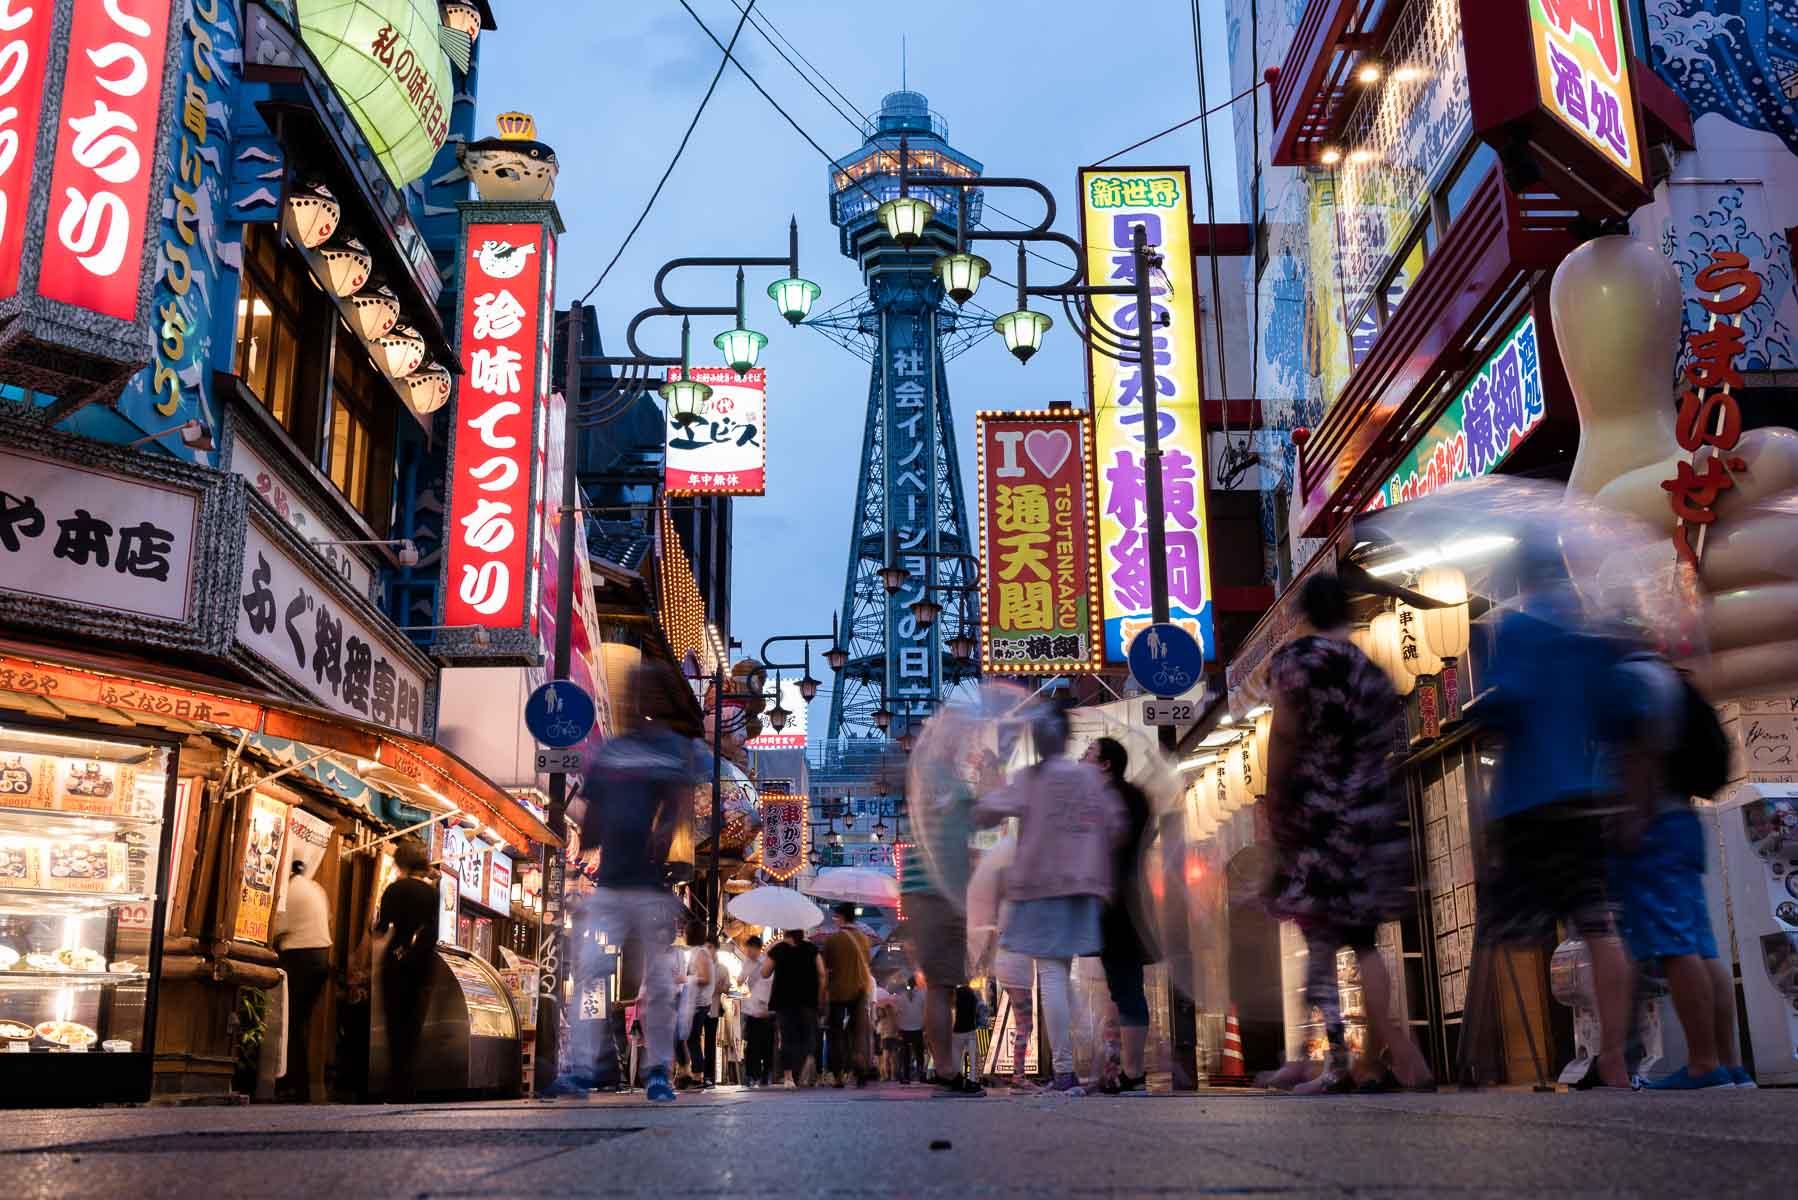 Christian Meixner Fotografie, Fotograf Zürich, Japan, Osaka, Reisen, Reisefotografie